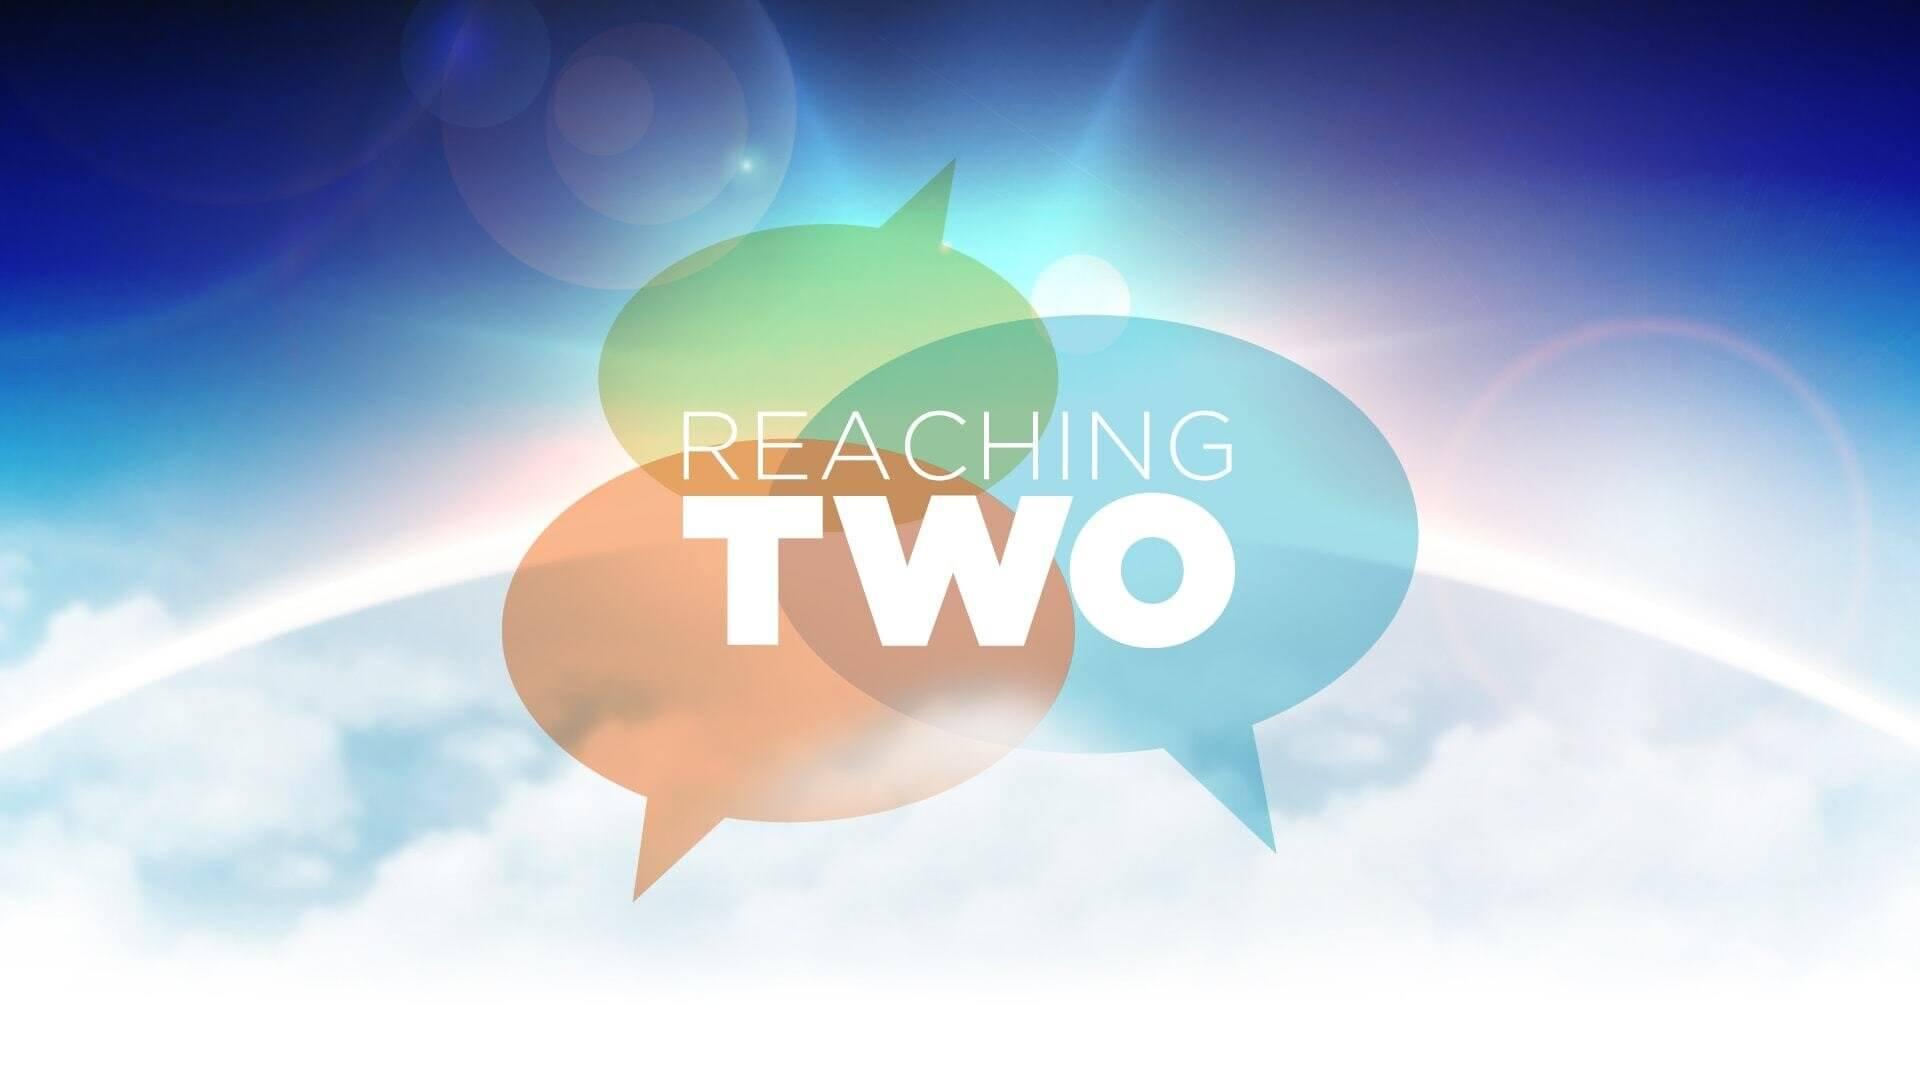 Reaching Two